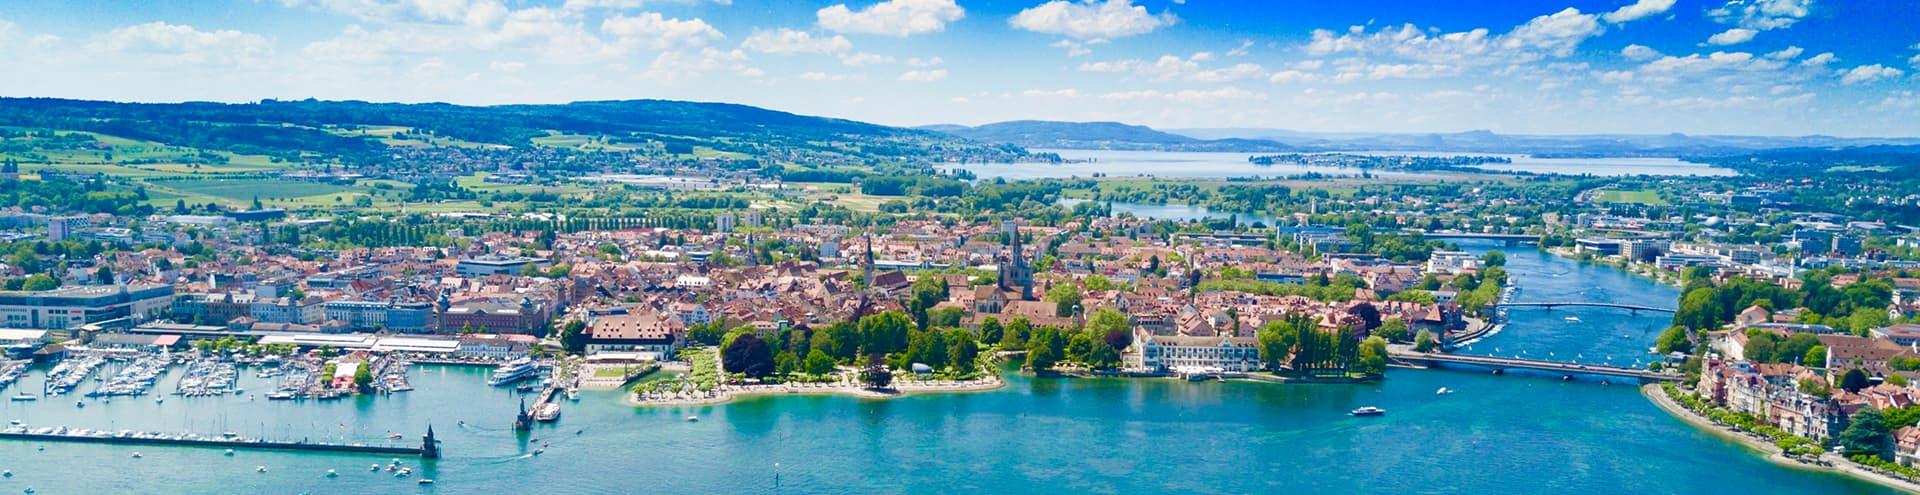 Immobilienbewertung Bodensee